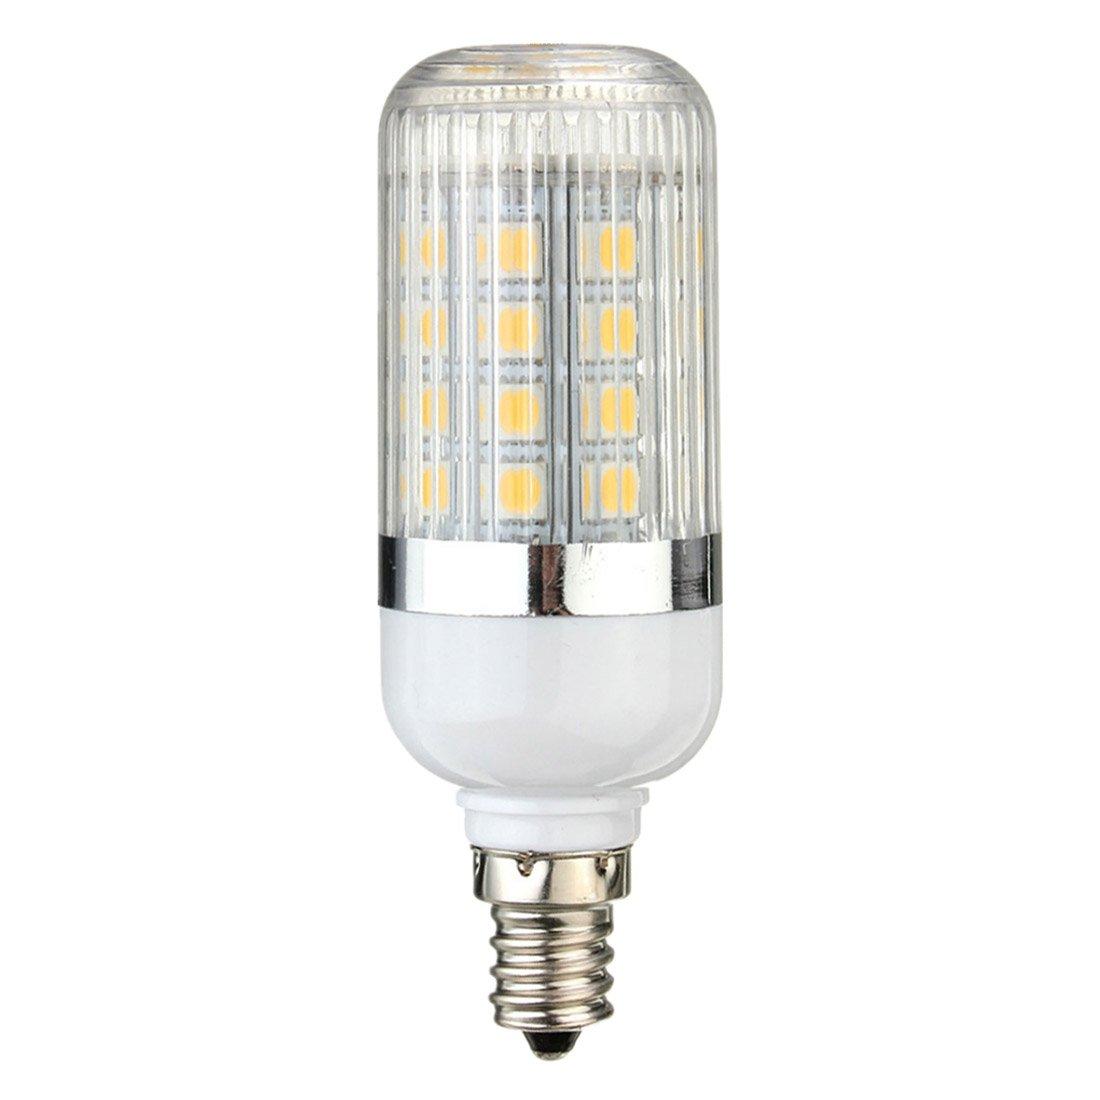 Corn Bulb - TOOGOO(R) E12 5W Non Dimmable 36 SMD 5050 LED Corn Light Bulb Lamp Color Temperature:Warm White(3000-3500K) Amount:1Pcs